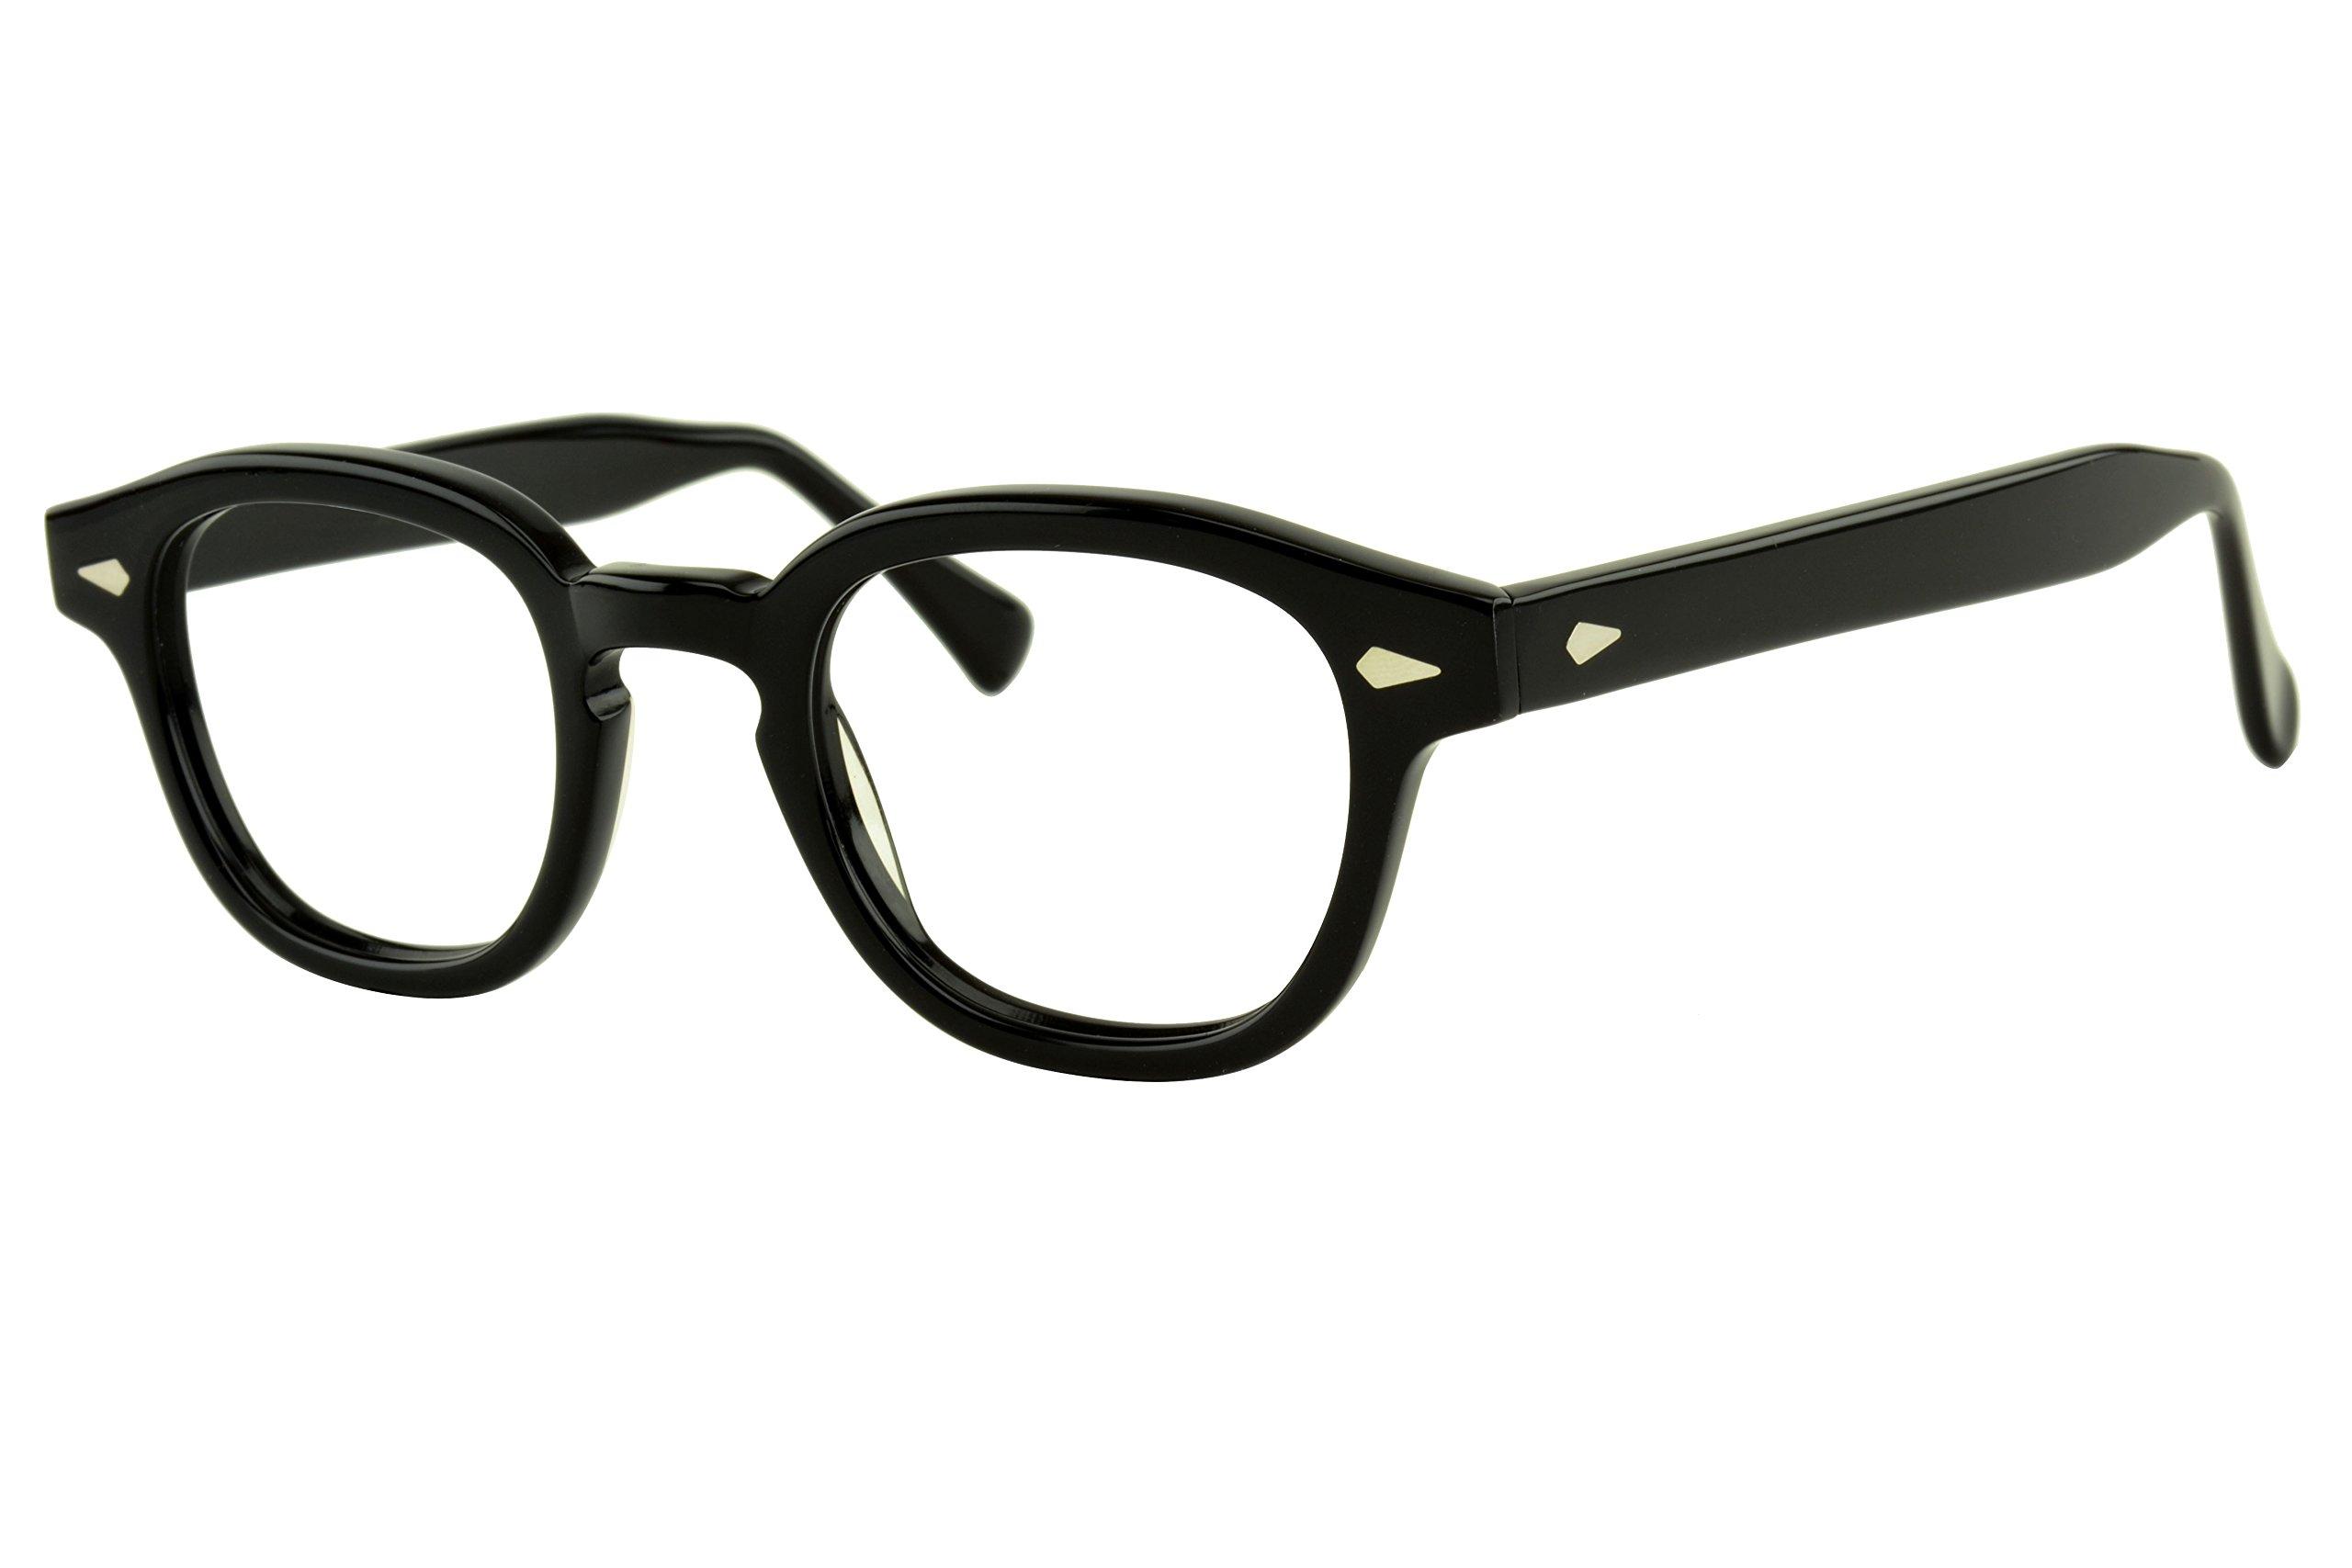 Verona Love Hand-Made Acetate Non Prescription Eyeglasses Frame Premium Eyewear Clear Lens Vintage Style Glasses Frames (VLV44 C001)